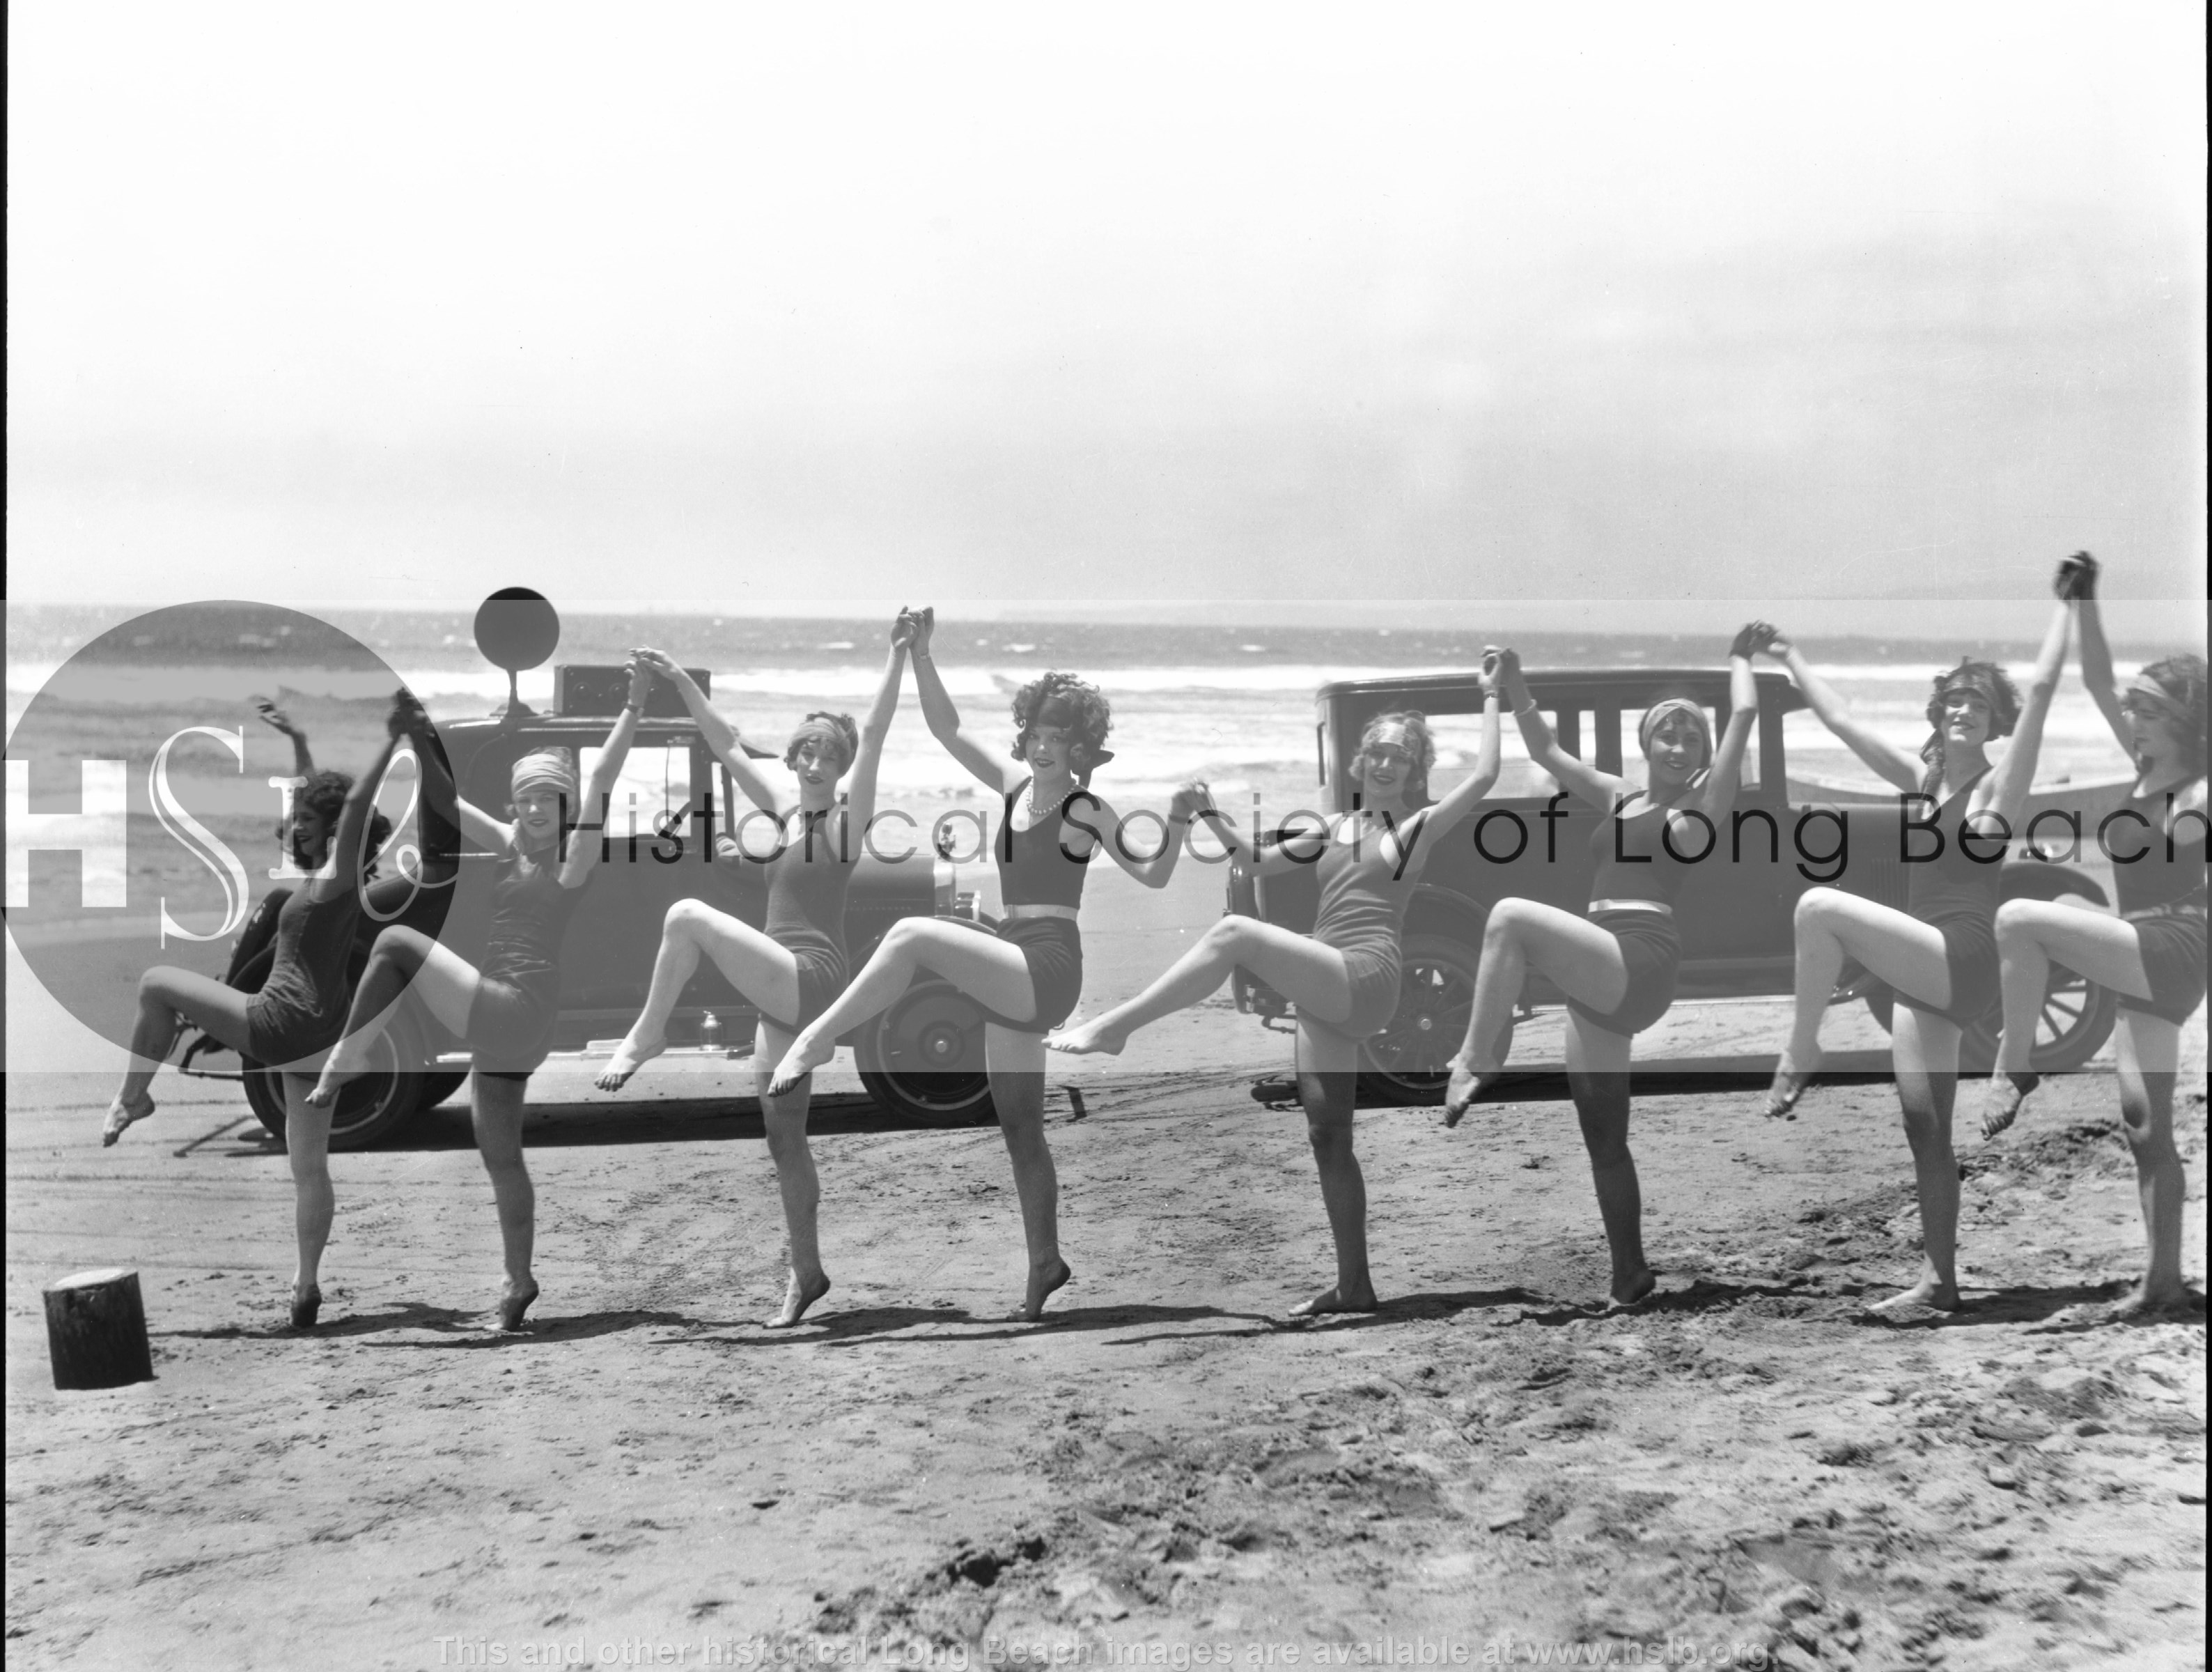 Bathers dancing, 1925 vintage photograph